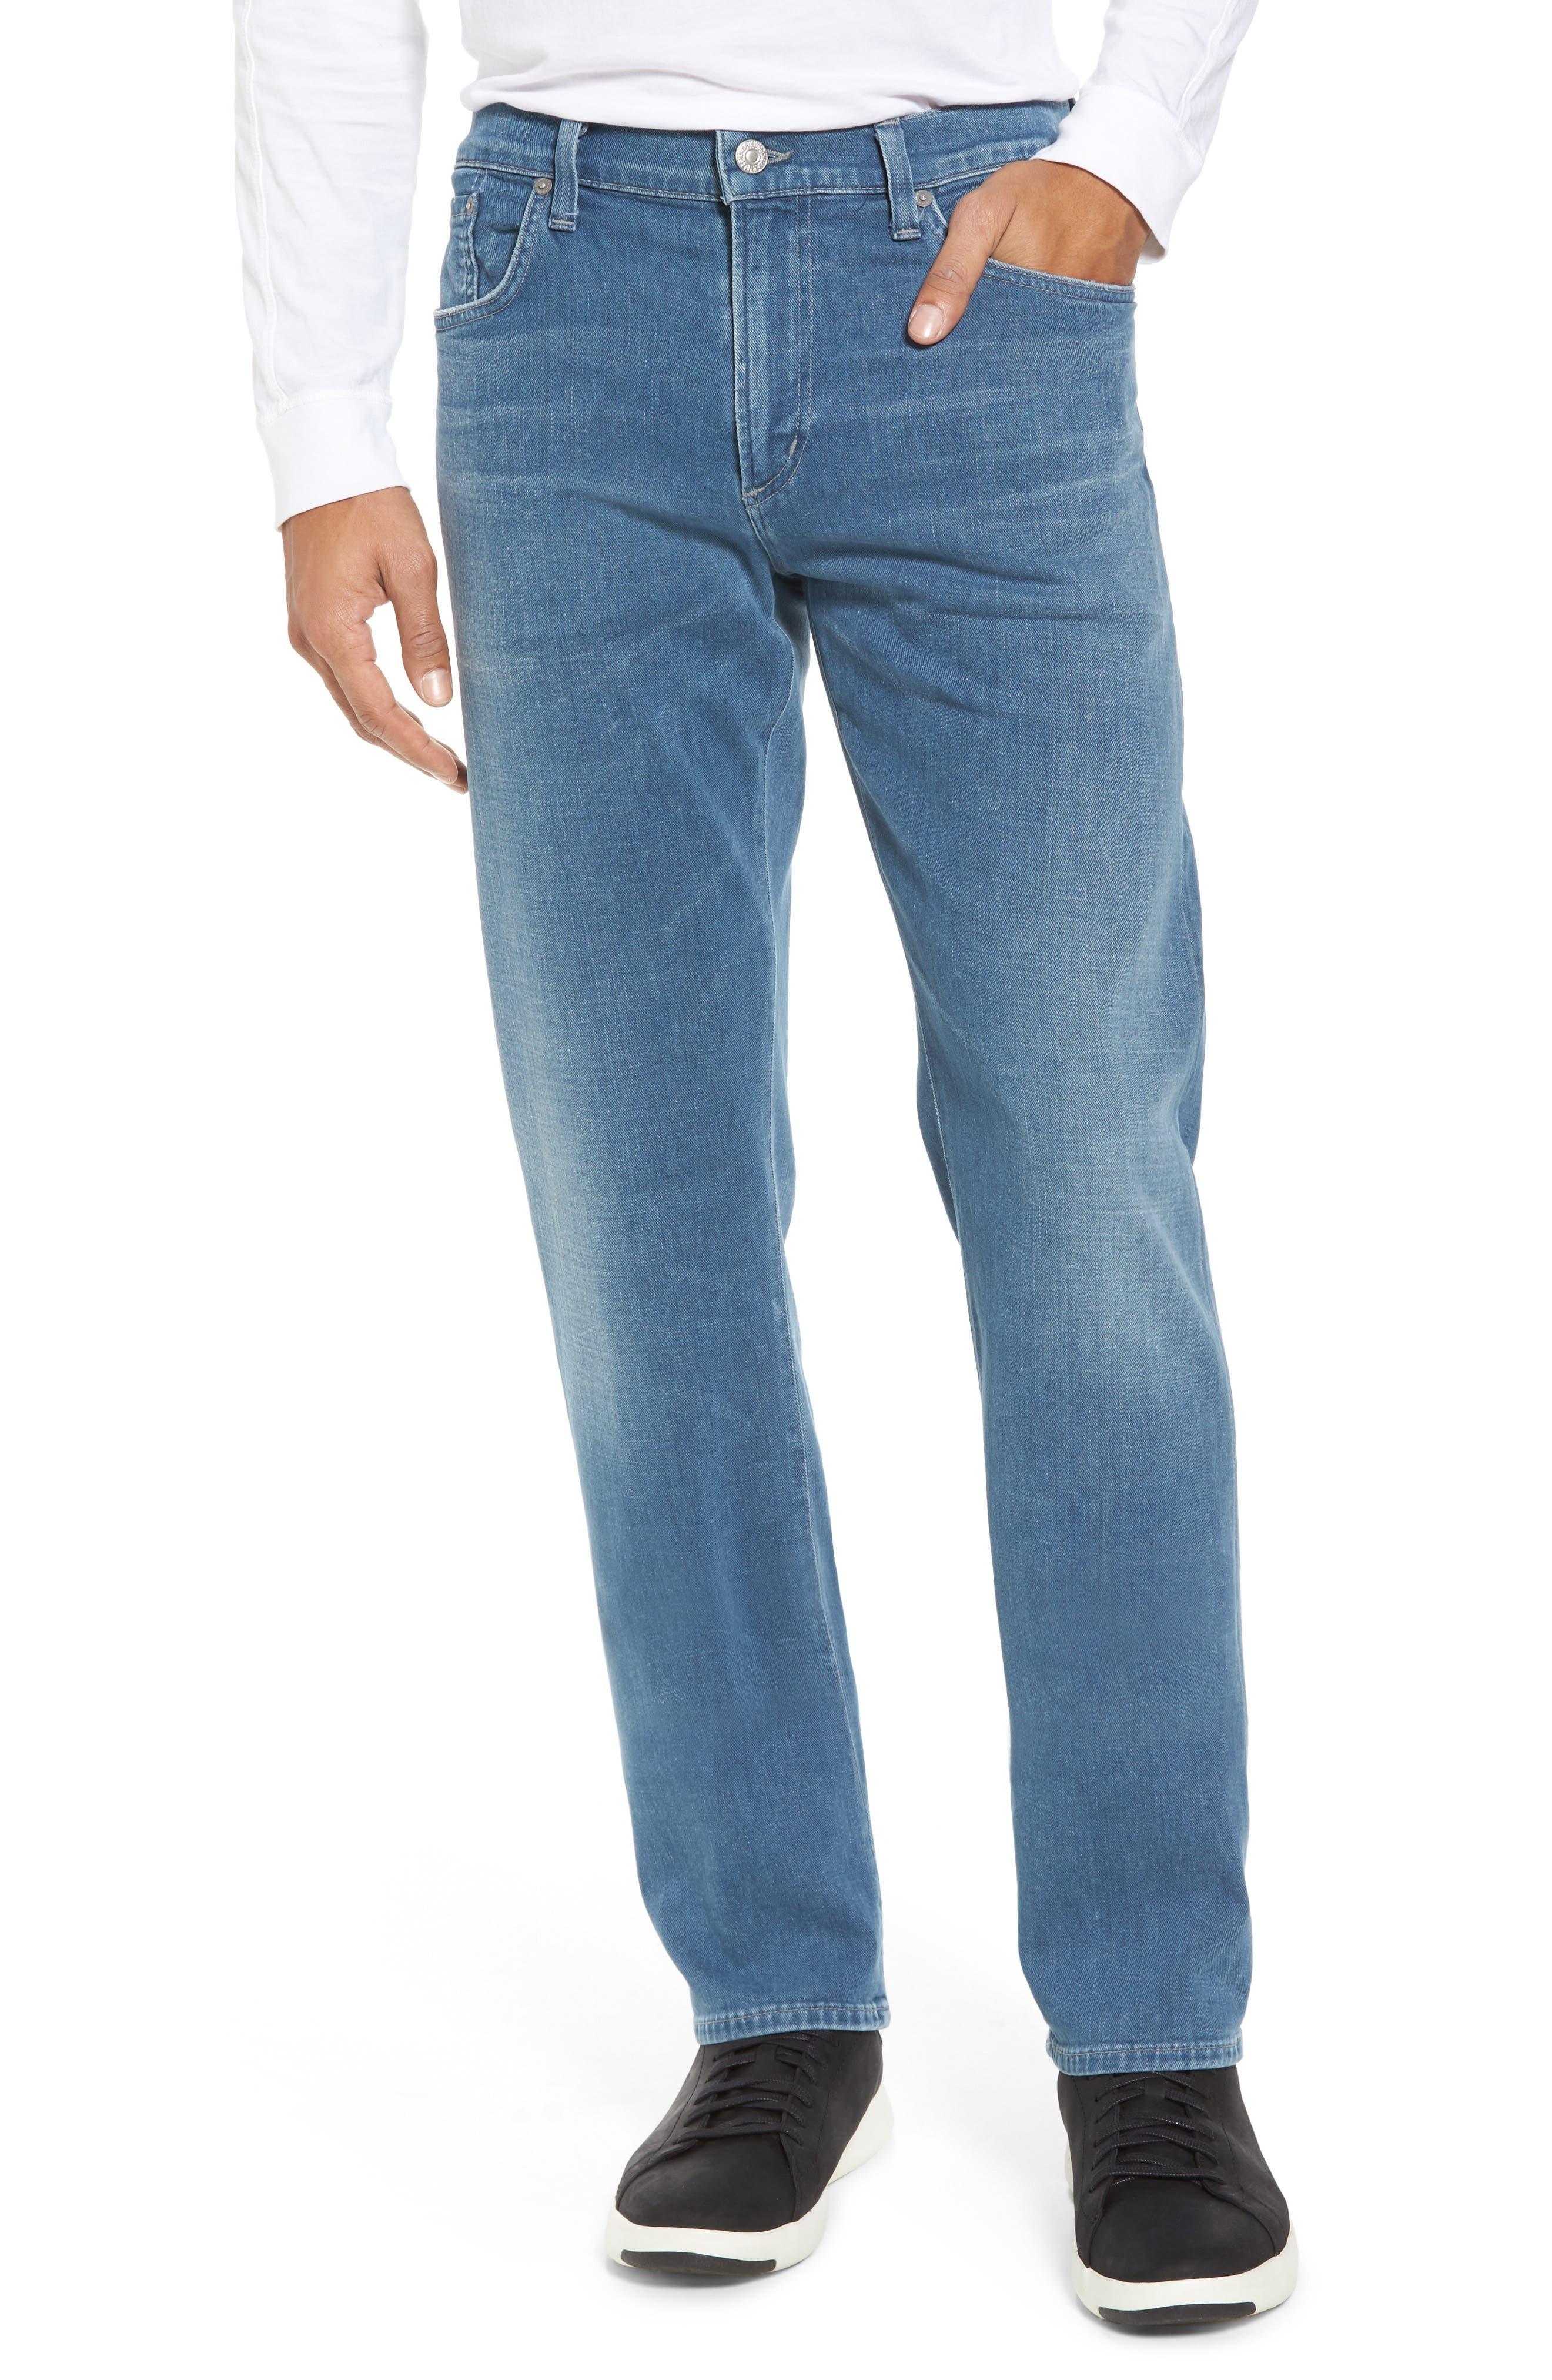 Core Slim Fit Jeans,                         Main,                         color, Silverstone